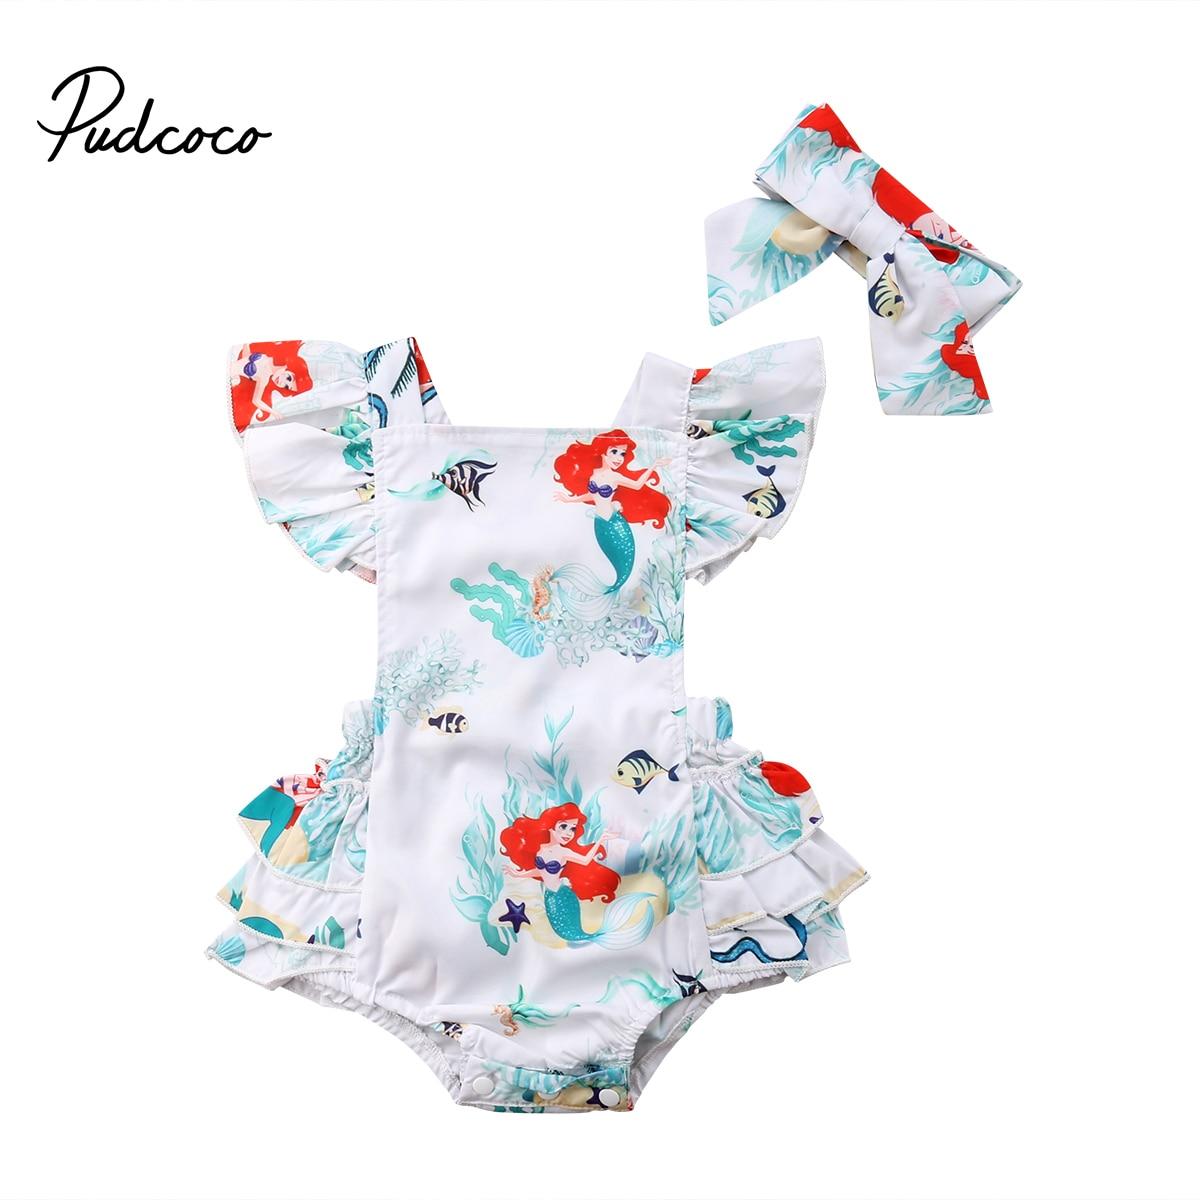 Newborn Baby Girls Mermaid Layered Ruffled Backless Bodysuit Babies Cartoon Bodysuits Headband Outfit Clothing Set